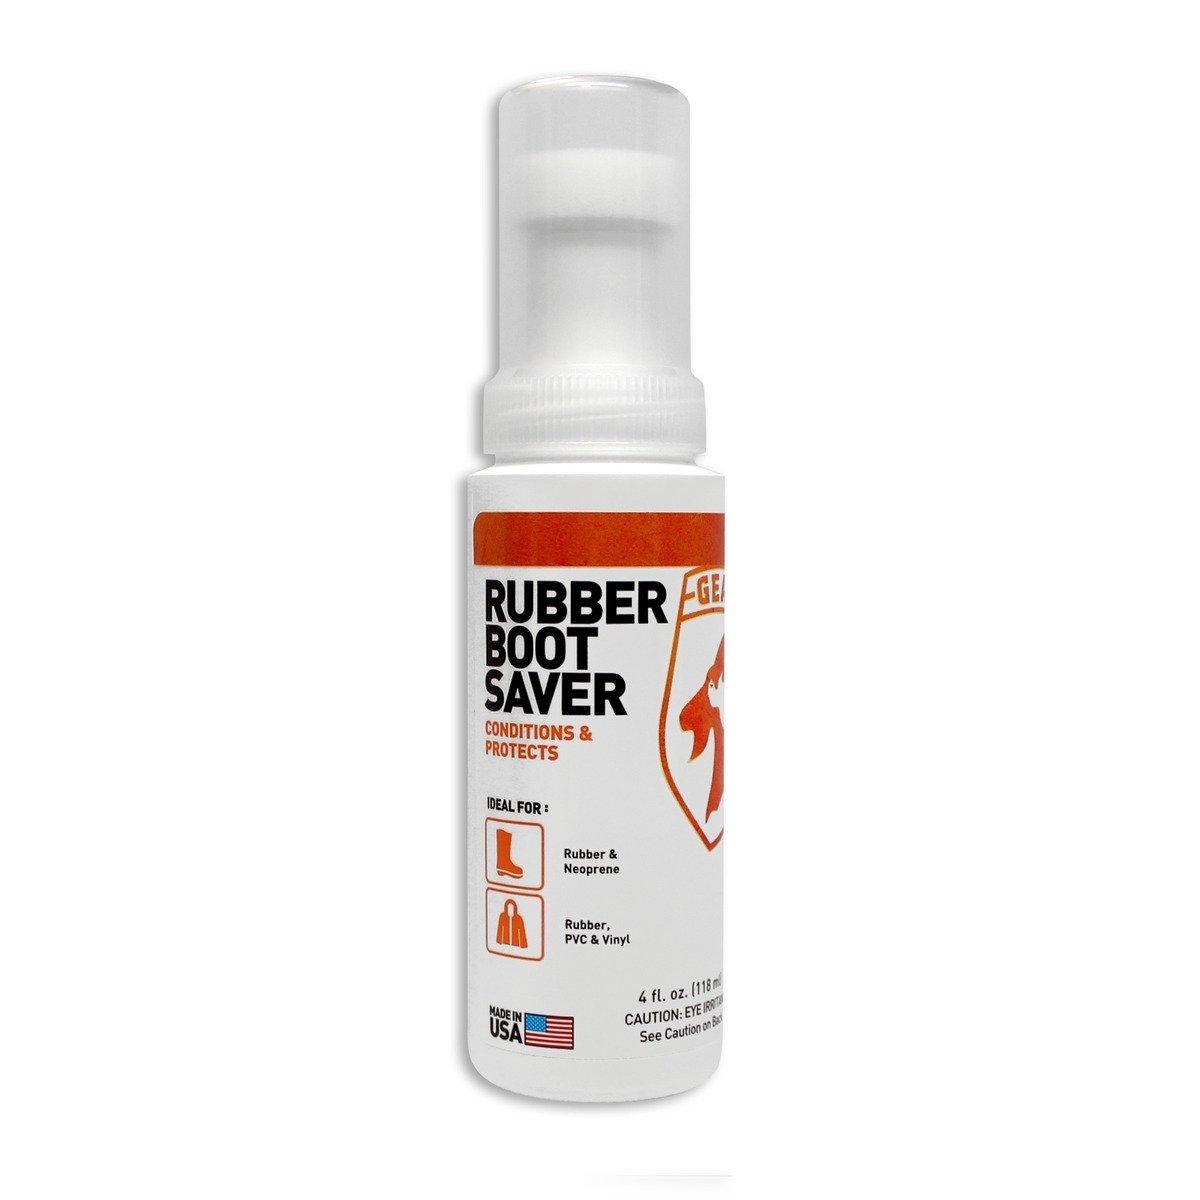 mcnett gear aid rubber boot saver rubber boots for men women children kids water proofing